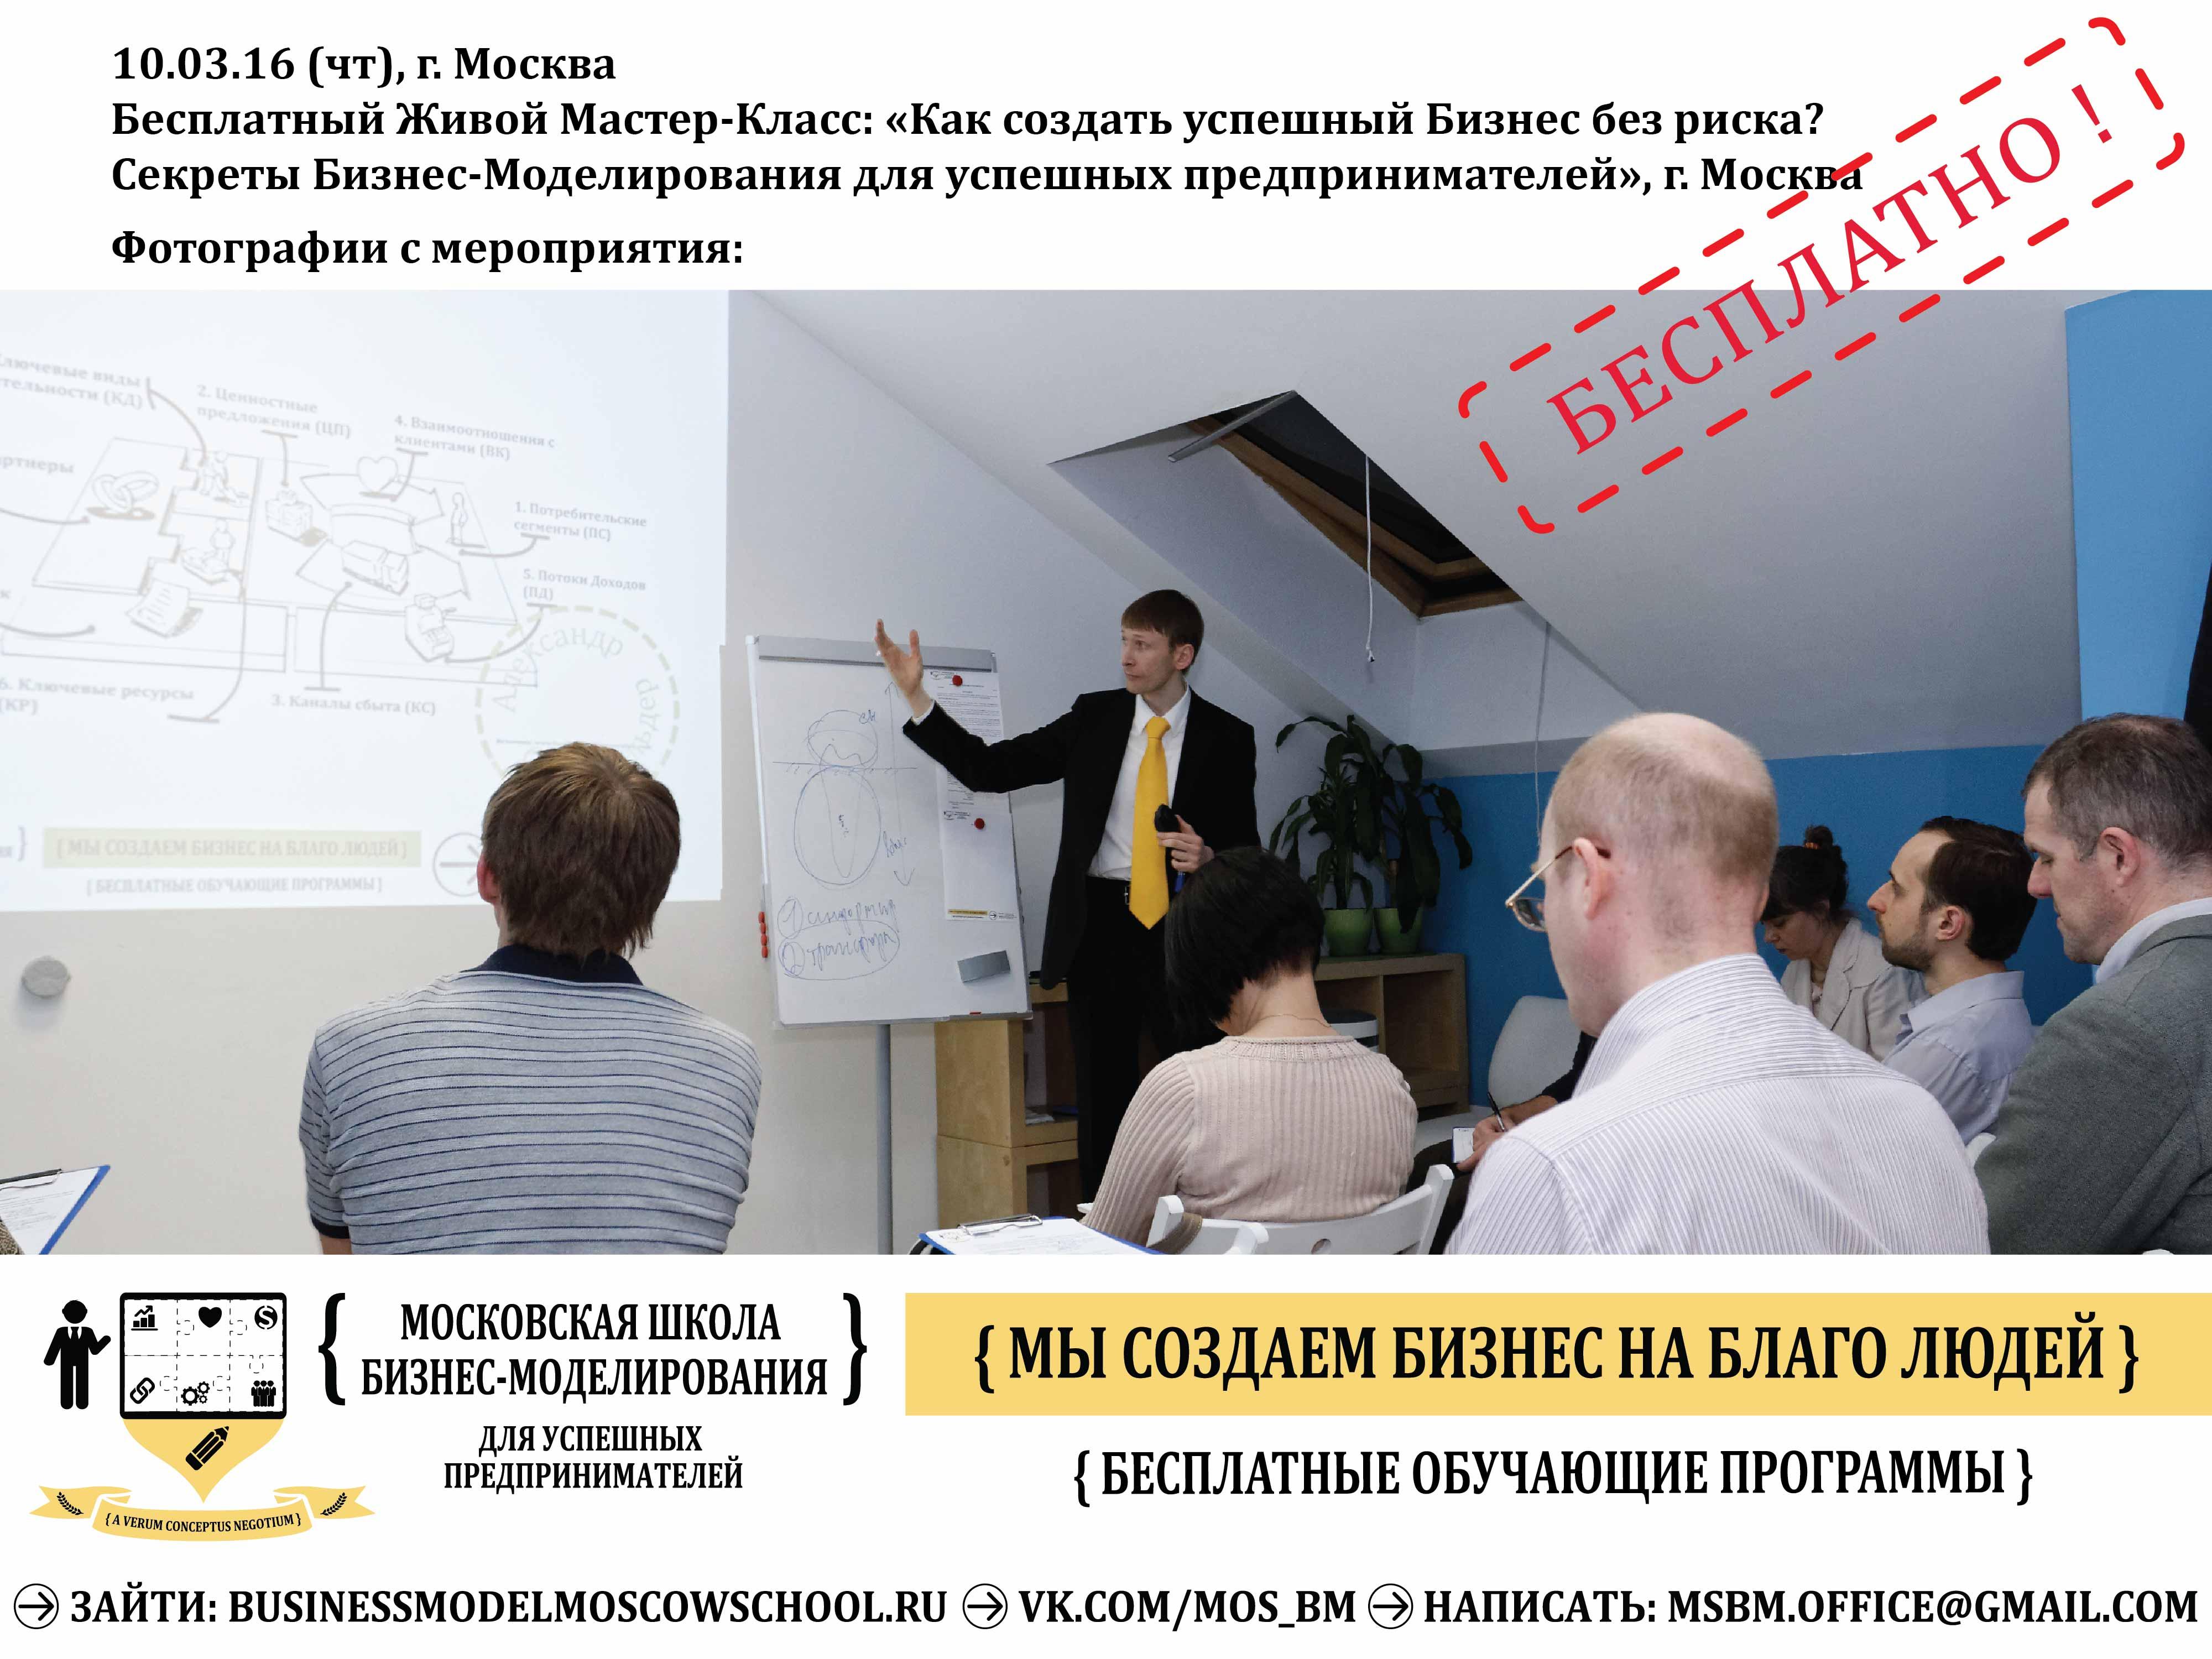 business_model_moscow_school_mclass_photo_10.03.16-3